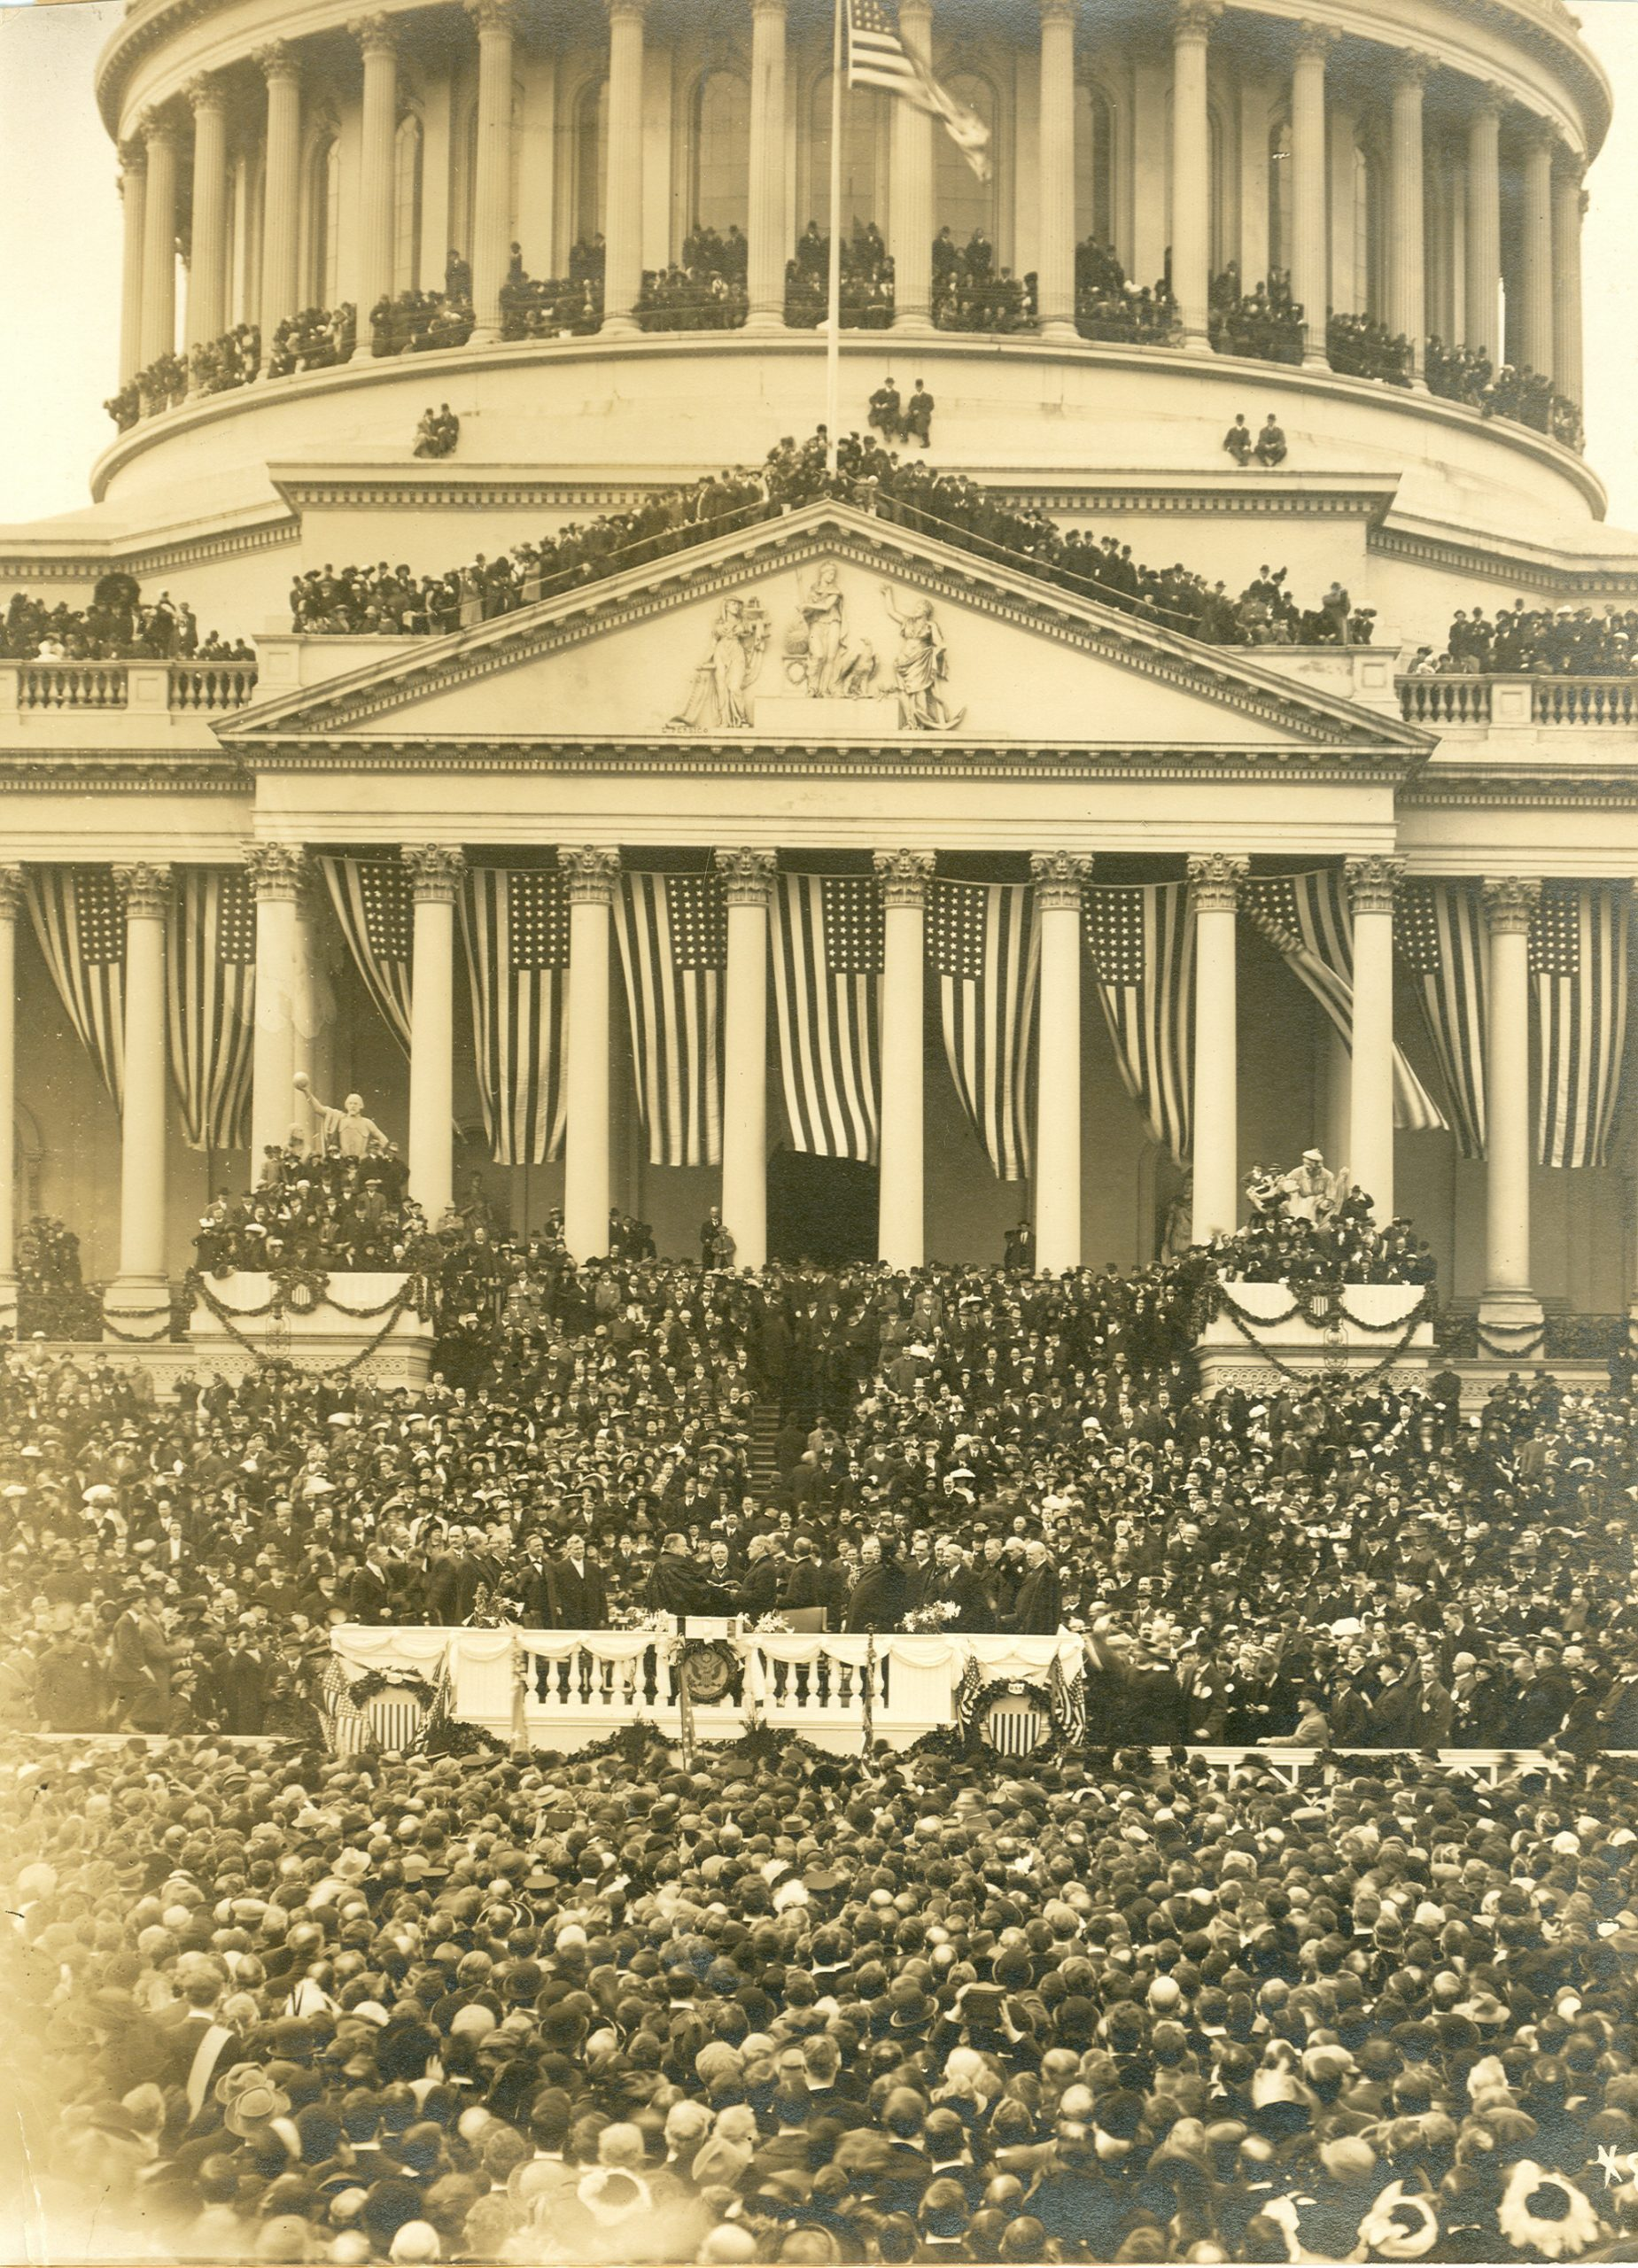 Woodrow Wilson's 1913 Inauguration